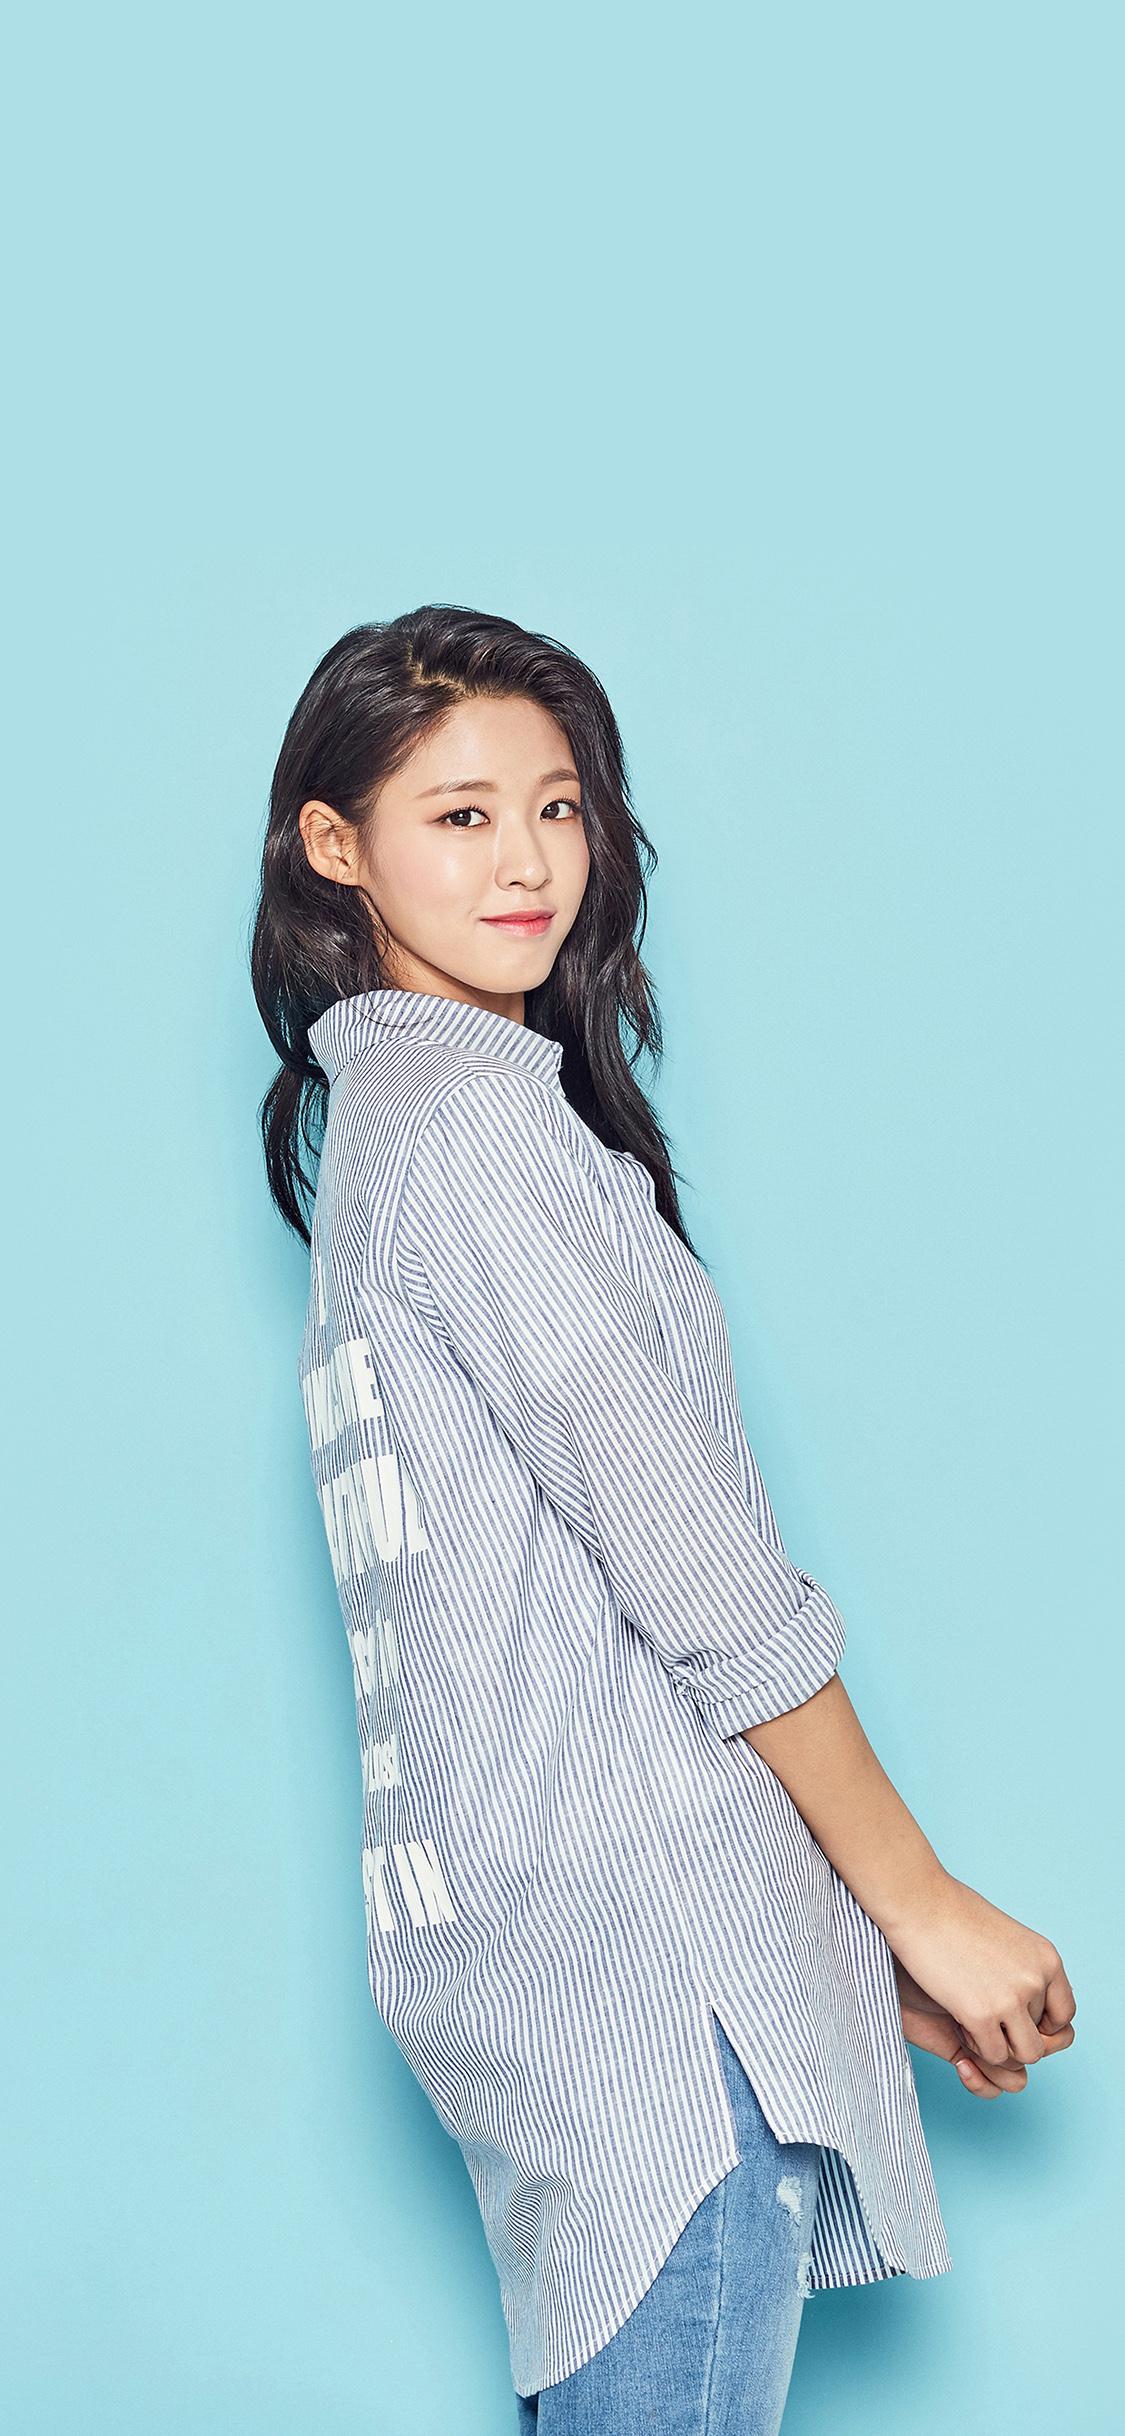 iPhoneXpapers.com-Apple-iPhone-wallpaper-hn42-sulhyun-blue-cute-kpop-girl